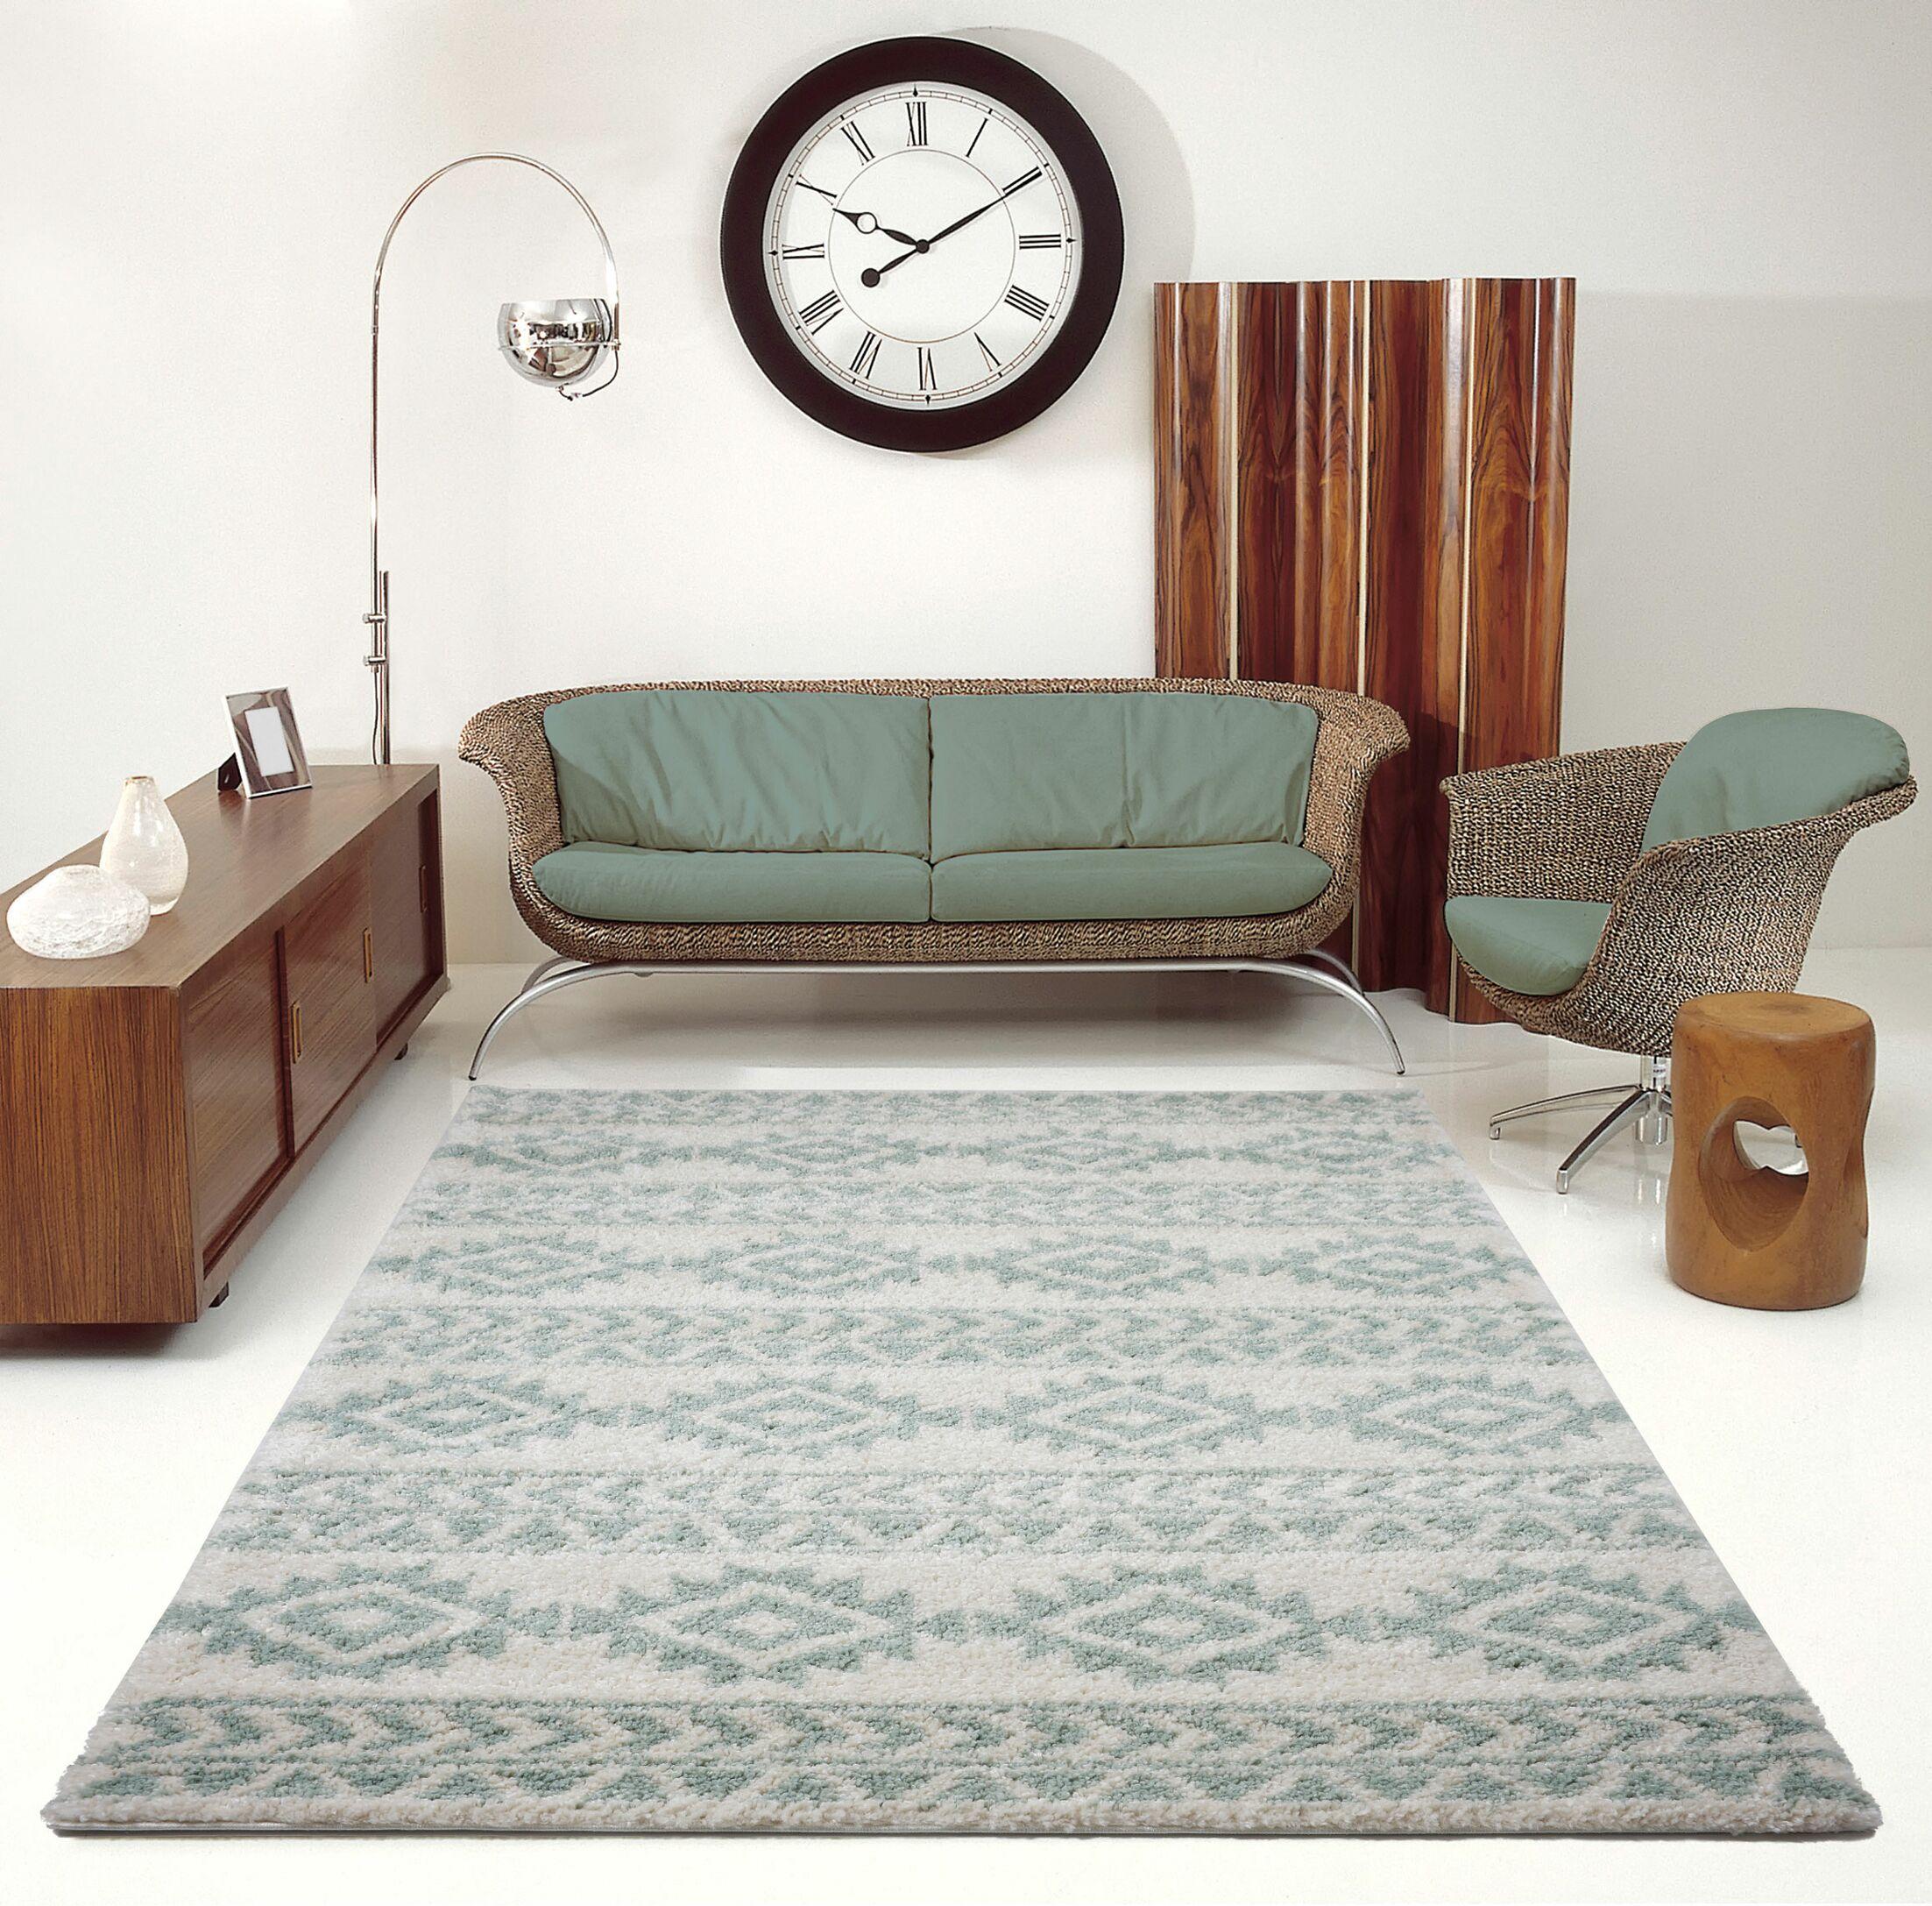 Hiebert Ivory/Aqua Area Rug Rug Size: Rectangle 5'3